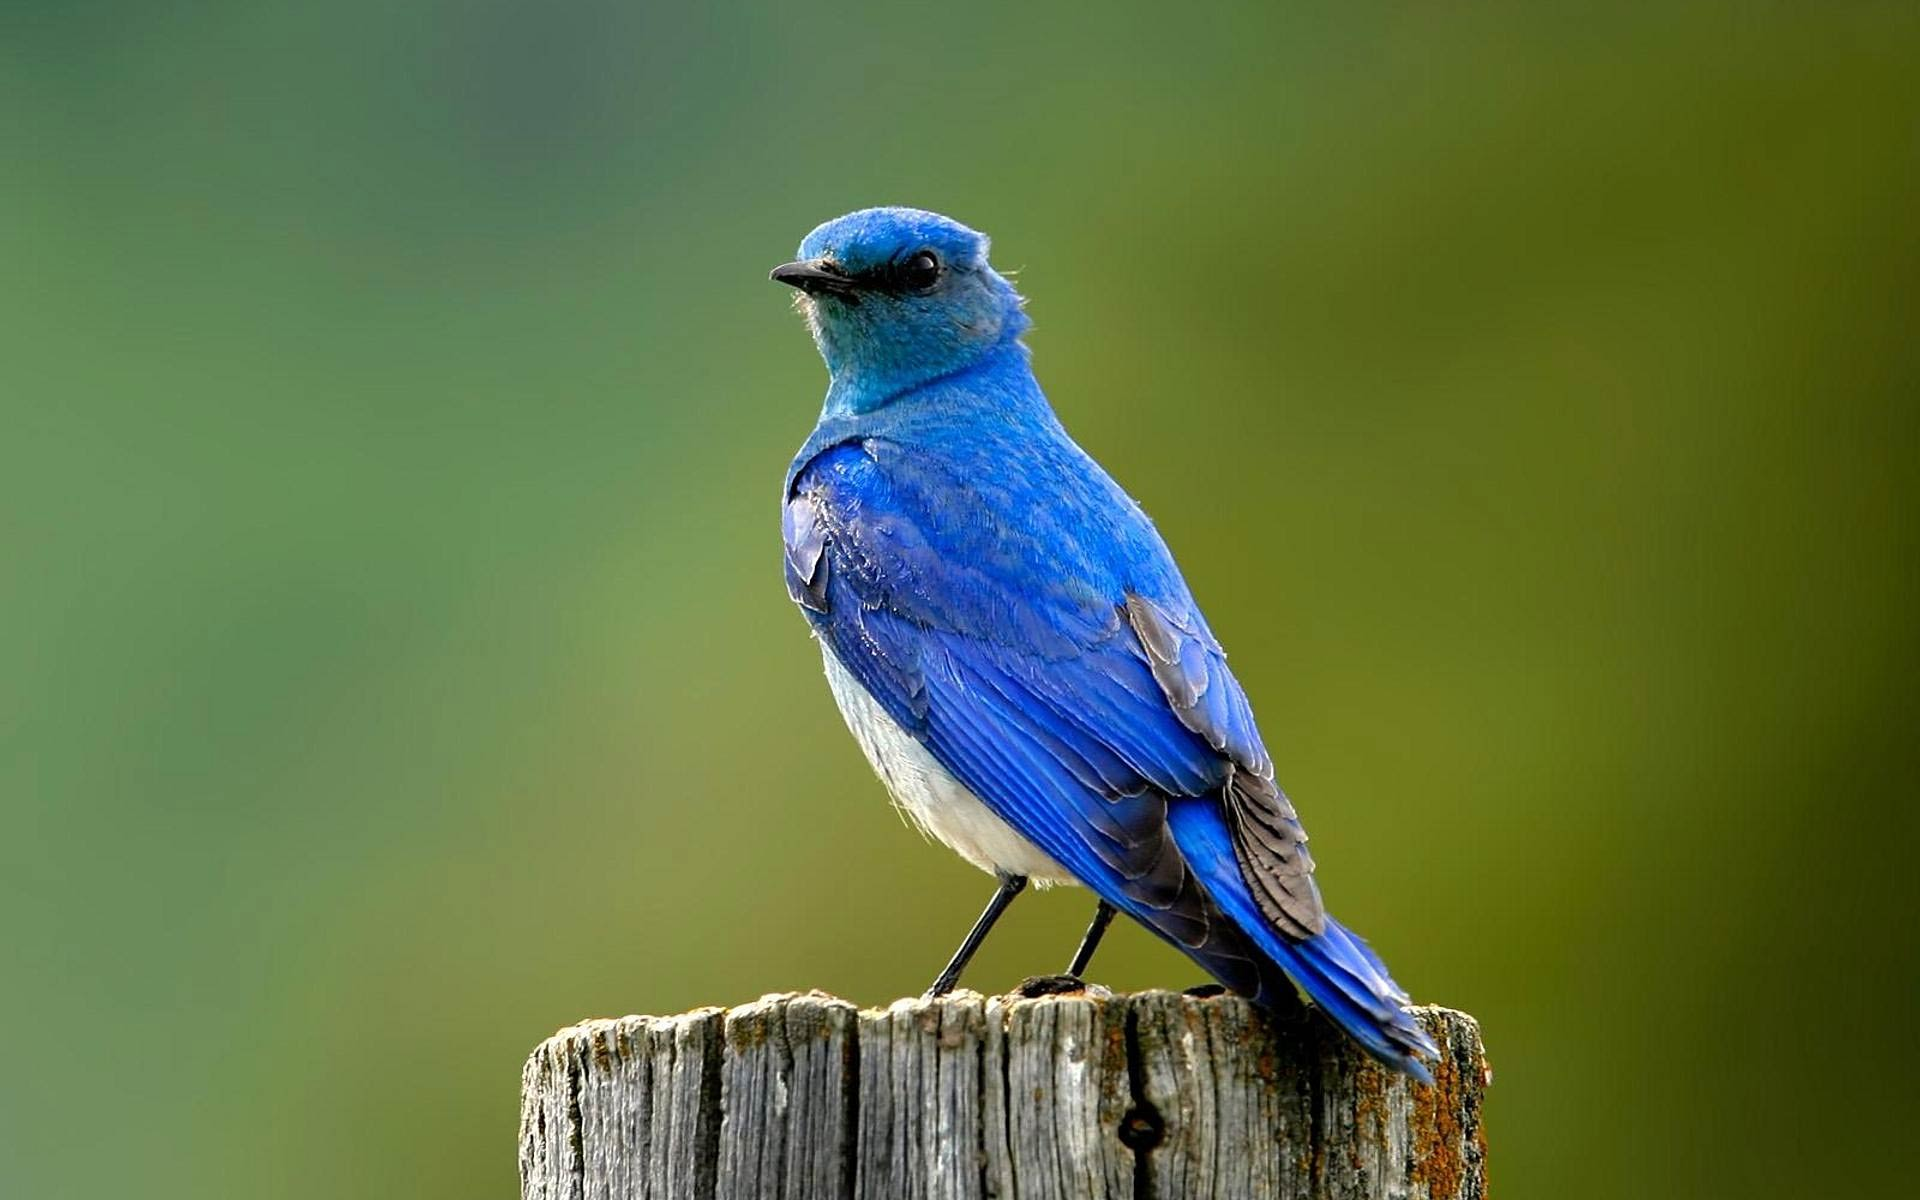 free Bluebird wallpaper wallpapers download